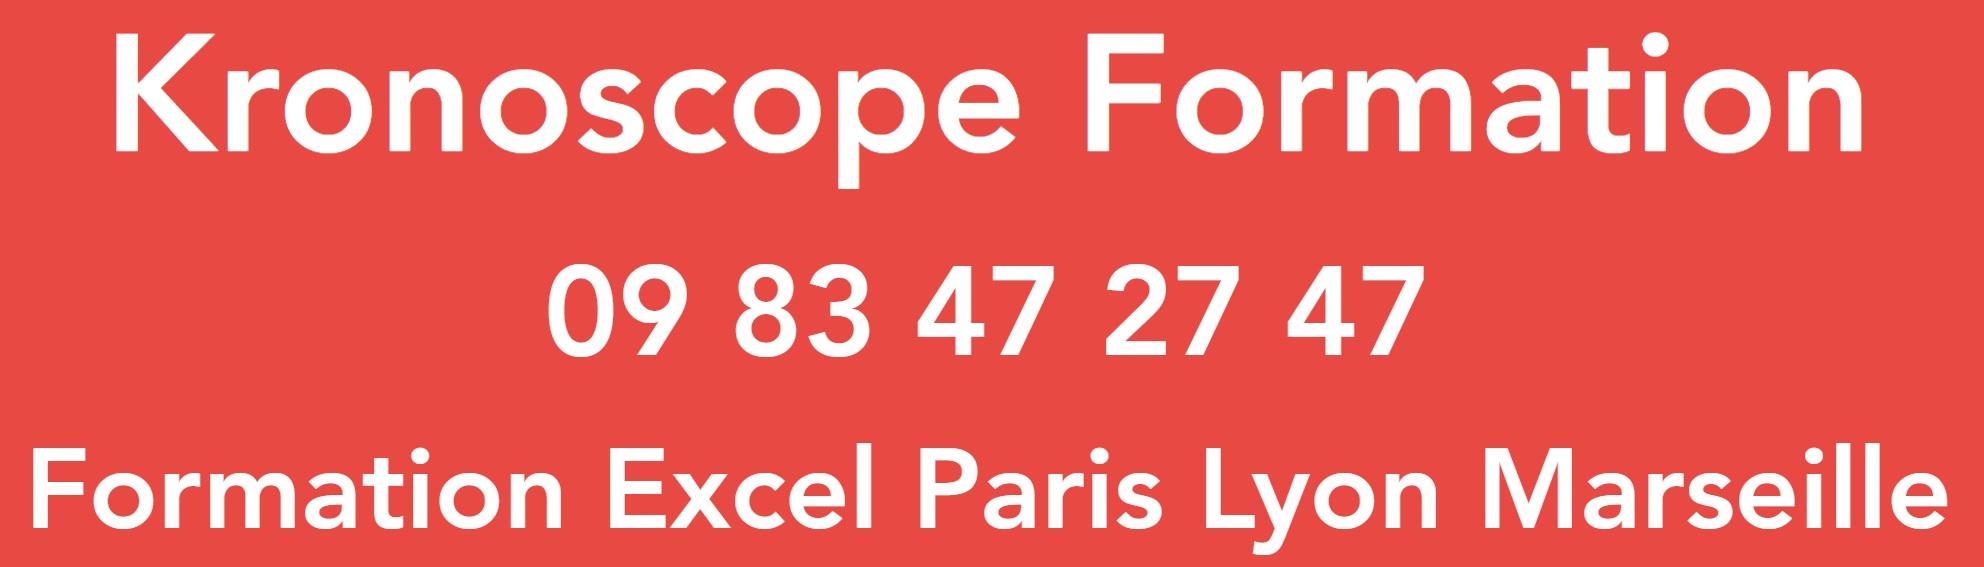 Kronoscope Formation Excel